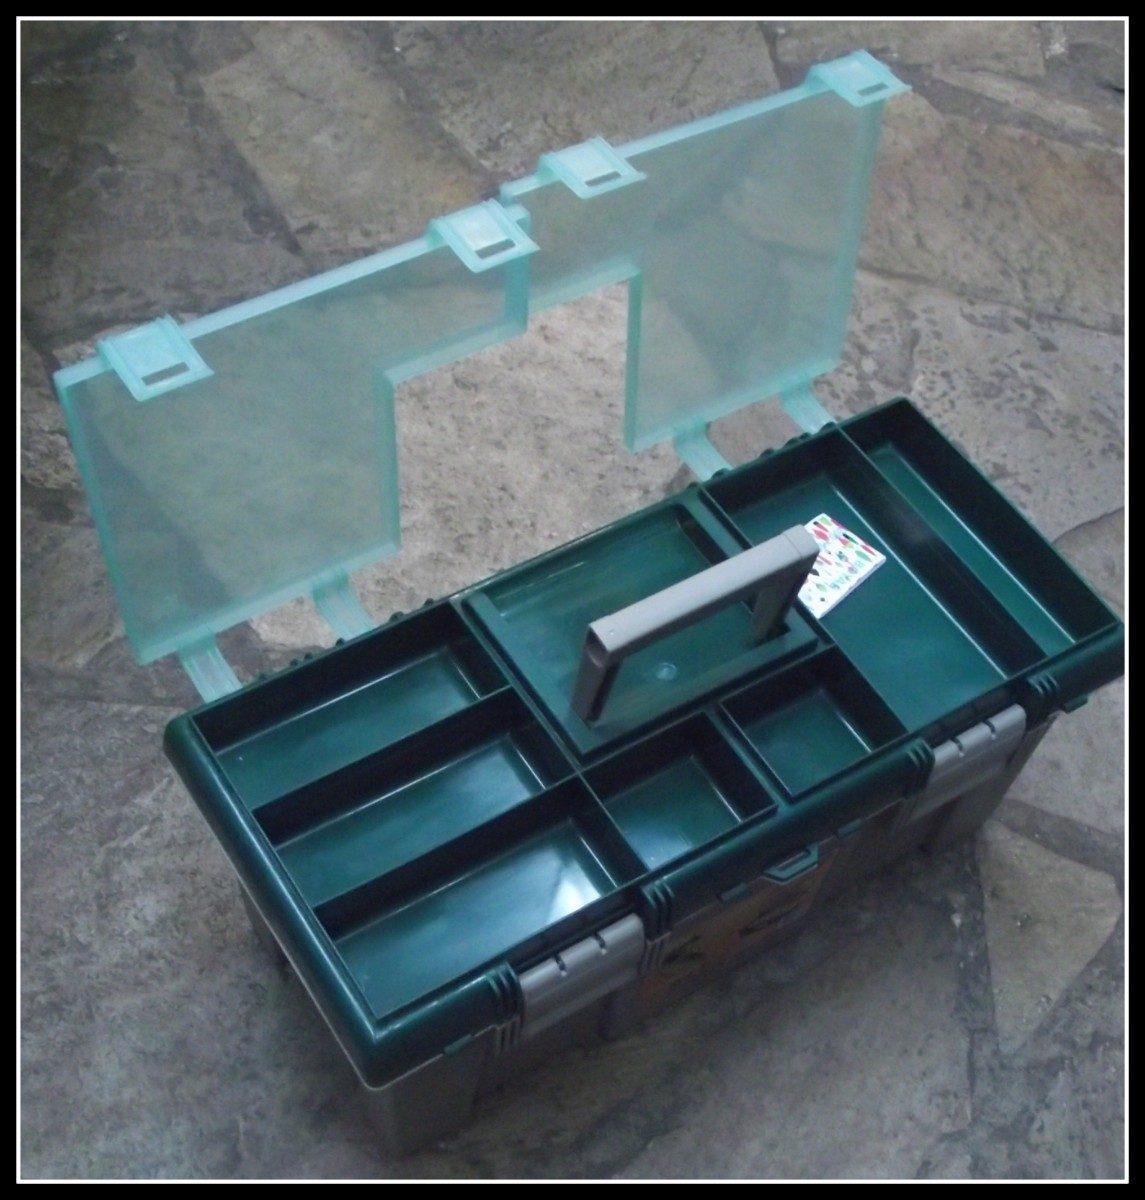 la mejor caja: